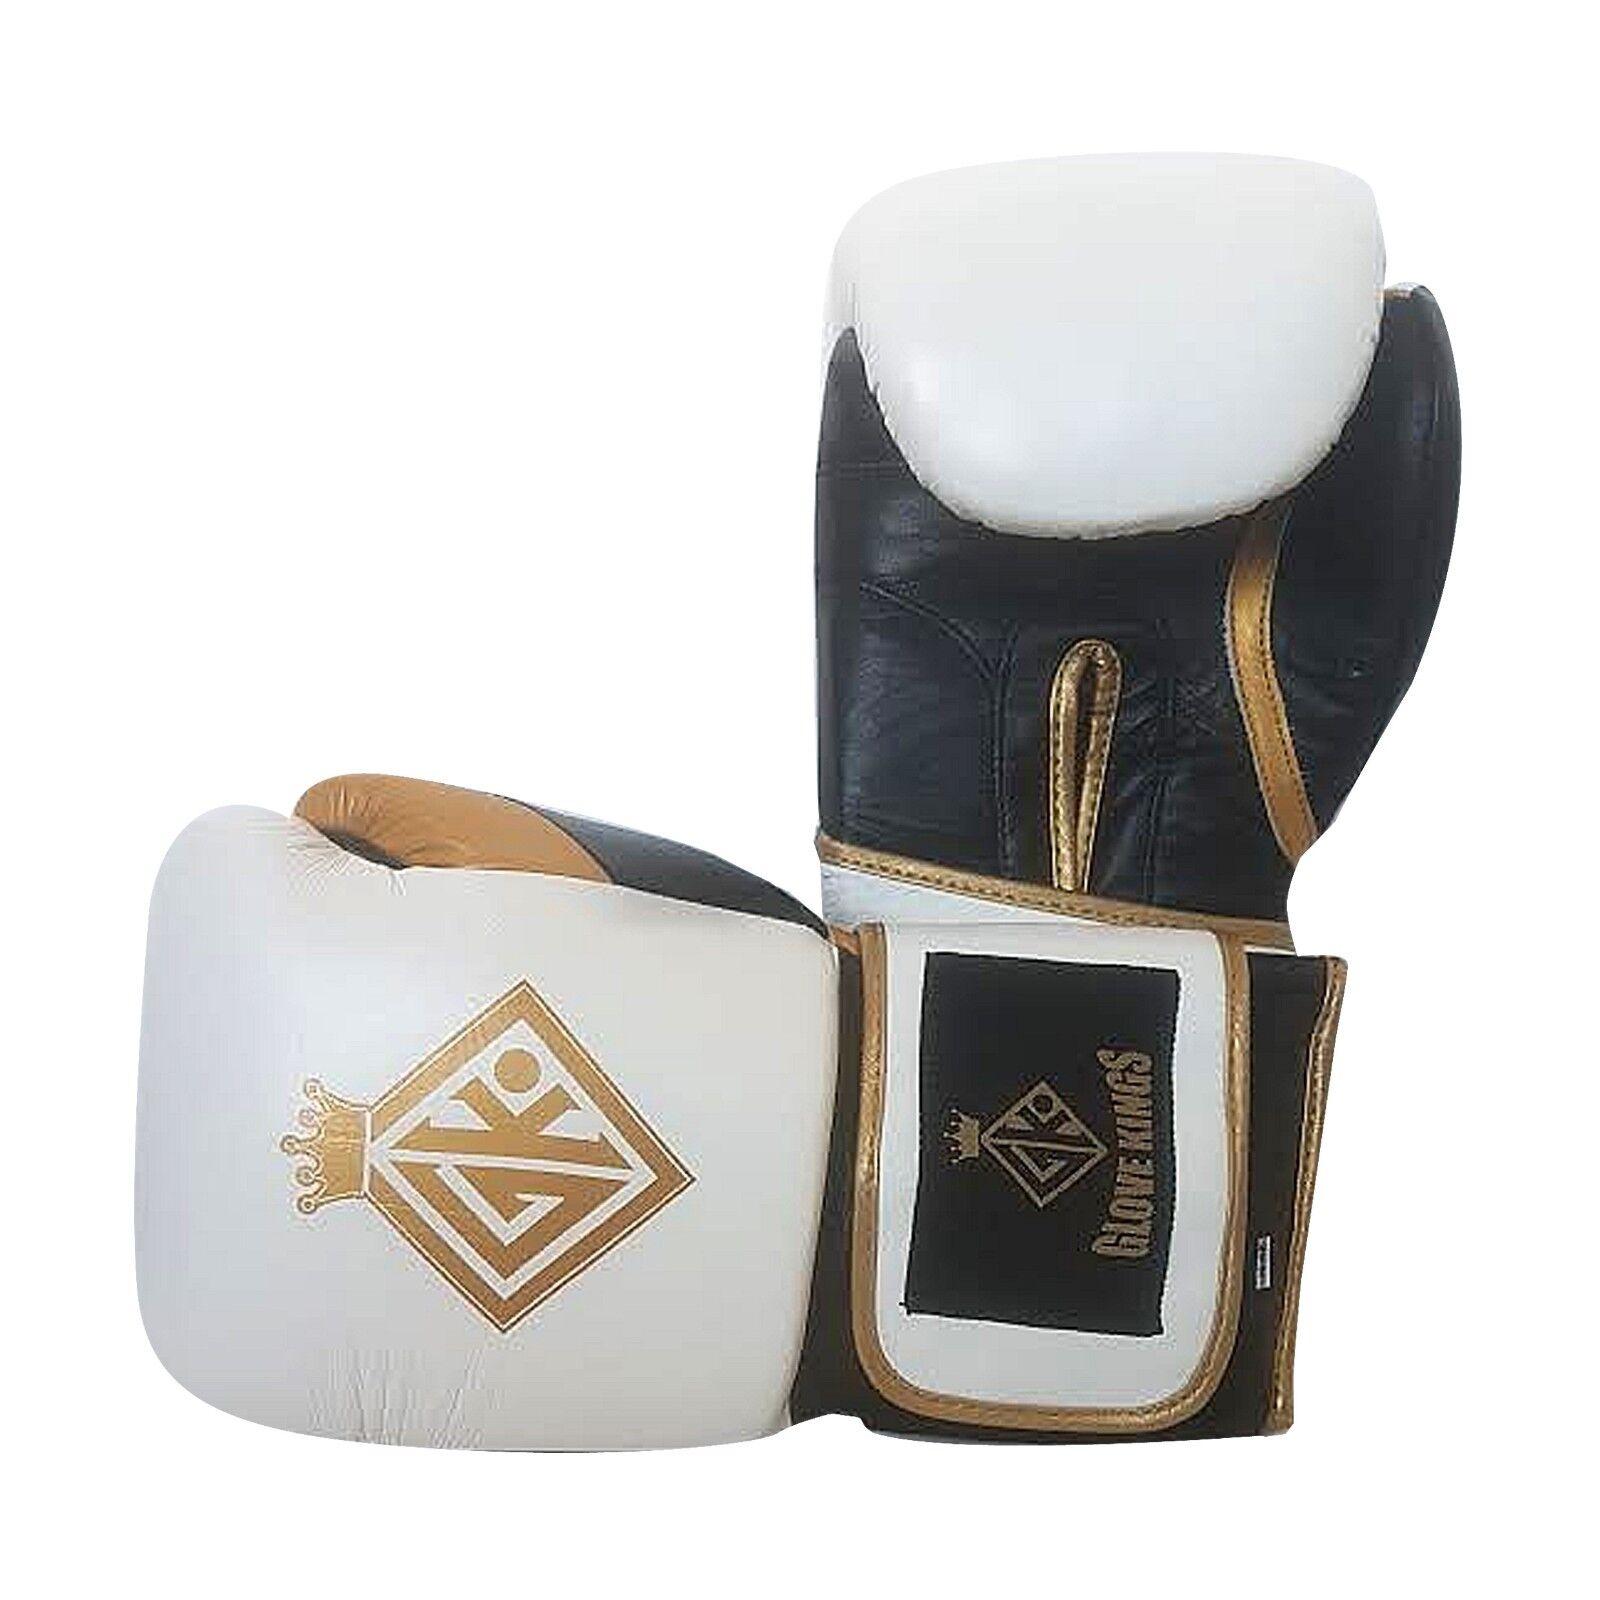 GLOVE KINGS GK BOXING GLOVES BY GOLD UFC INSPIROT BY GLOVES GRANT WINNING CLETO REYES ed3712